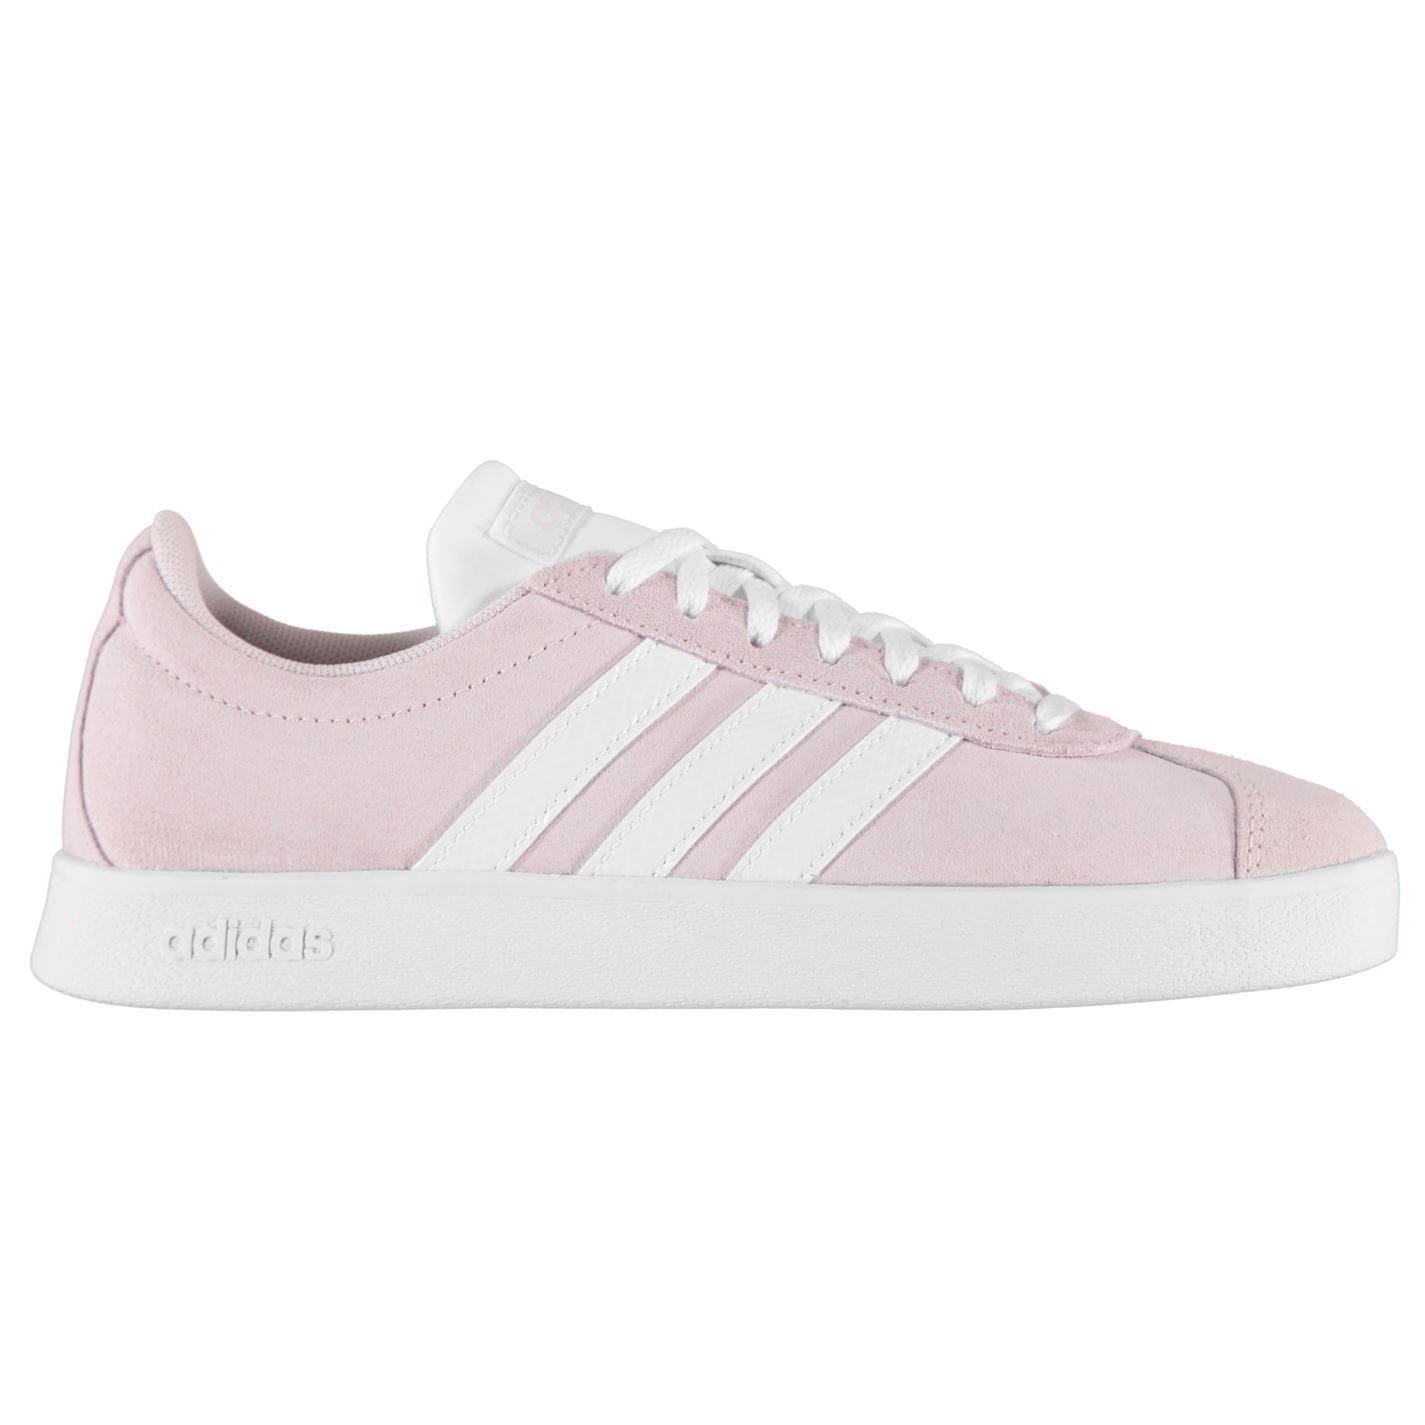 Adidas VL Court Suede Dámská obuv 27029606 5 (38)